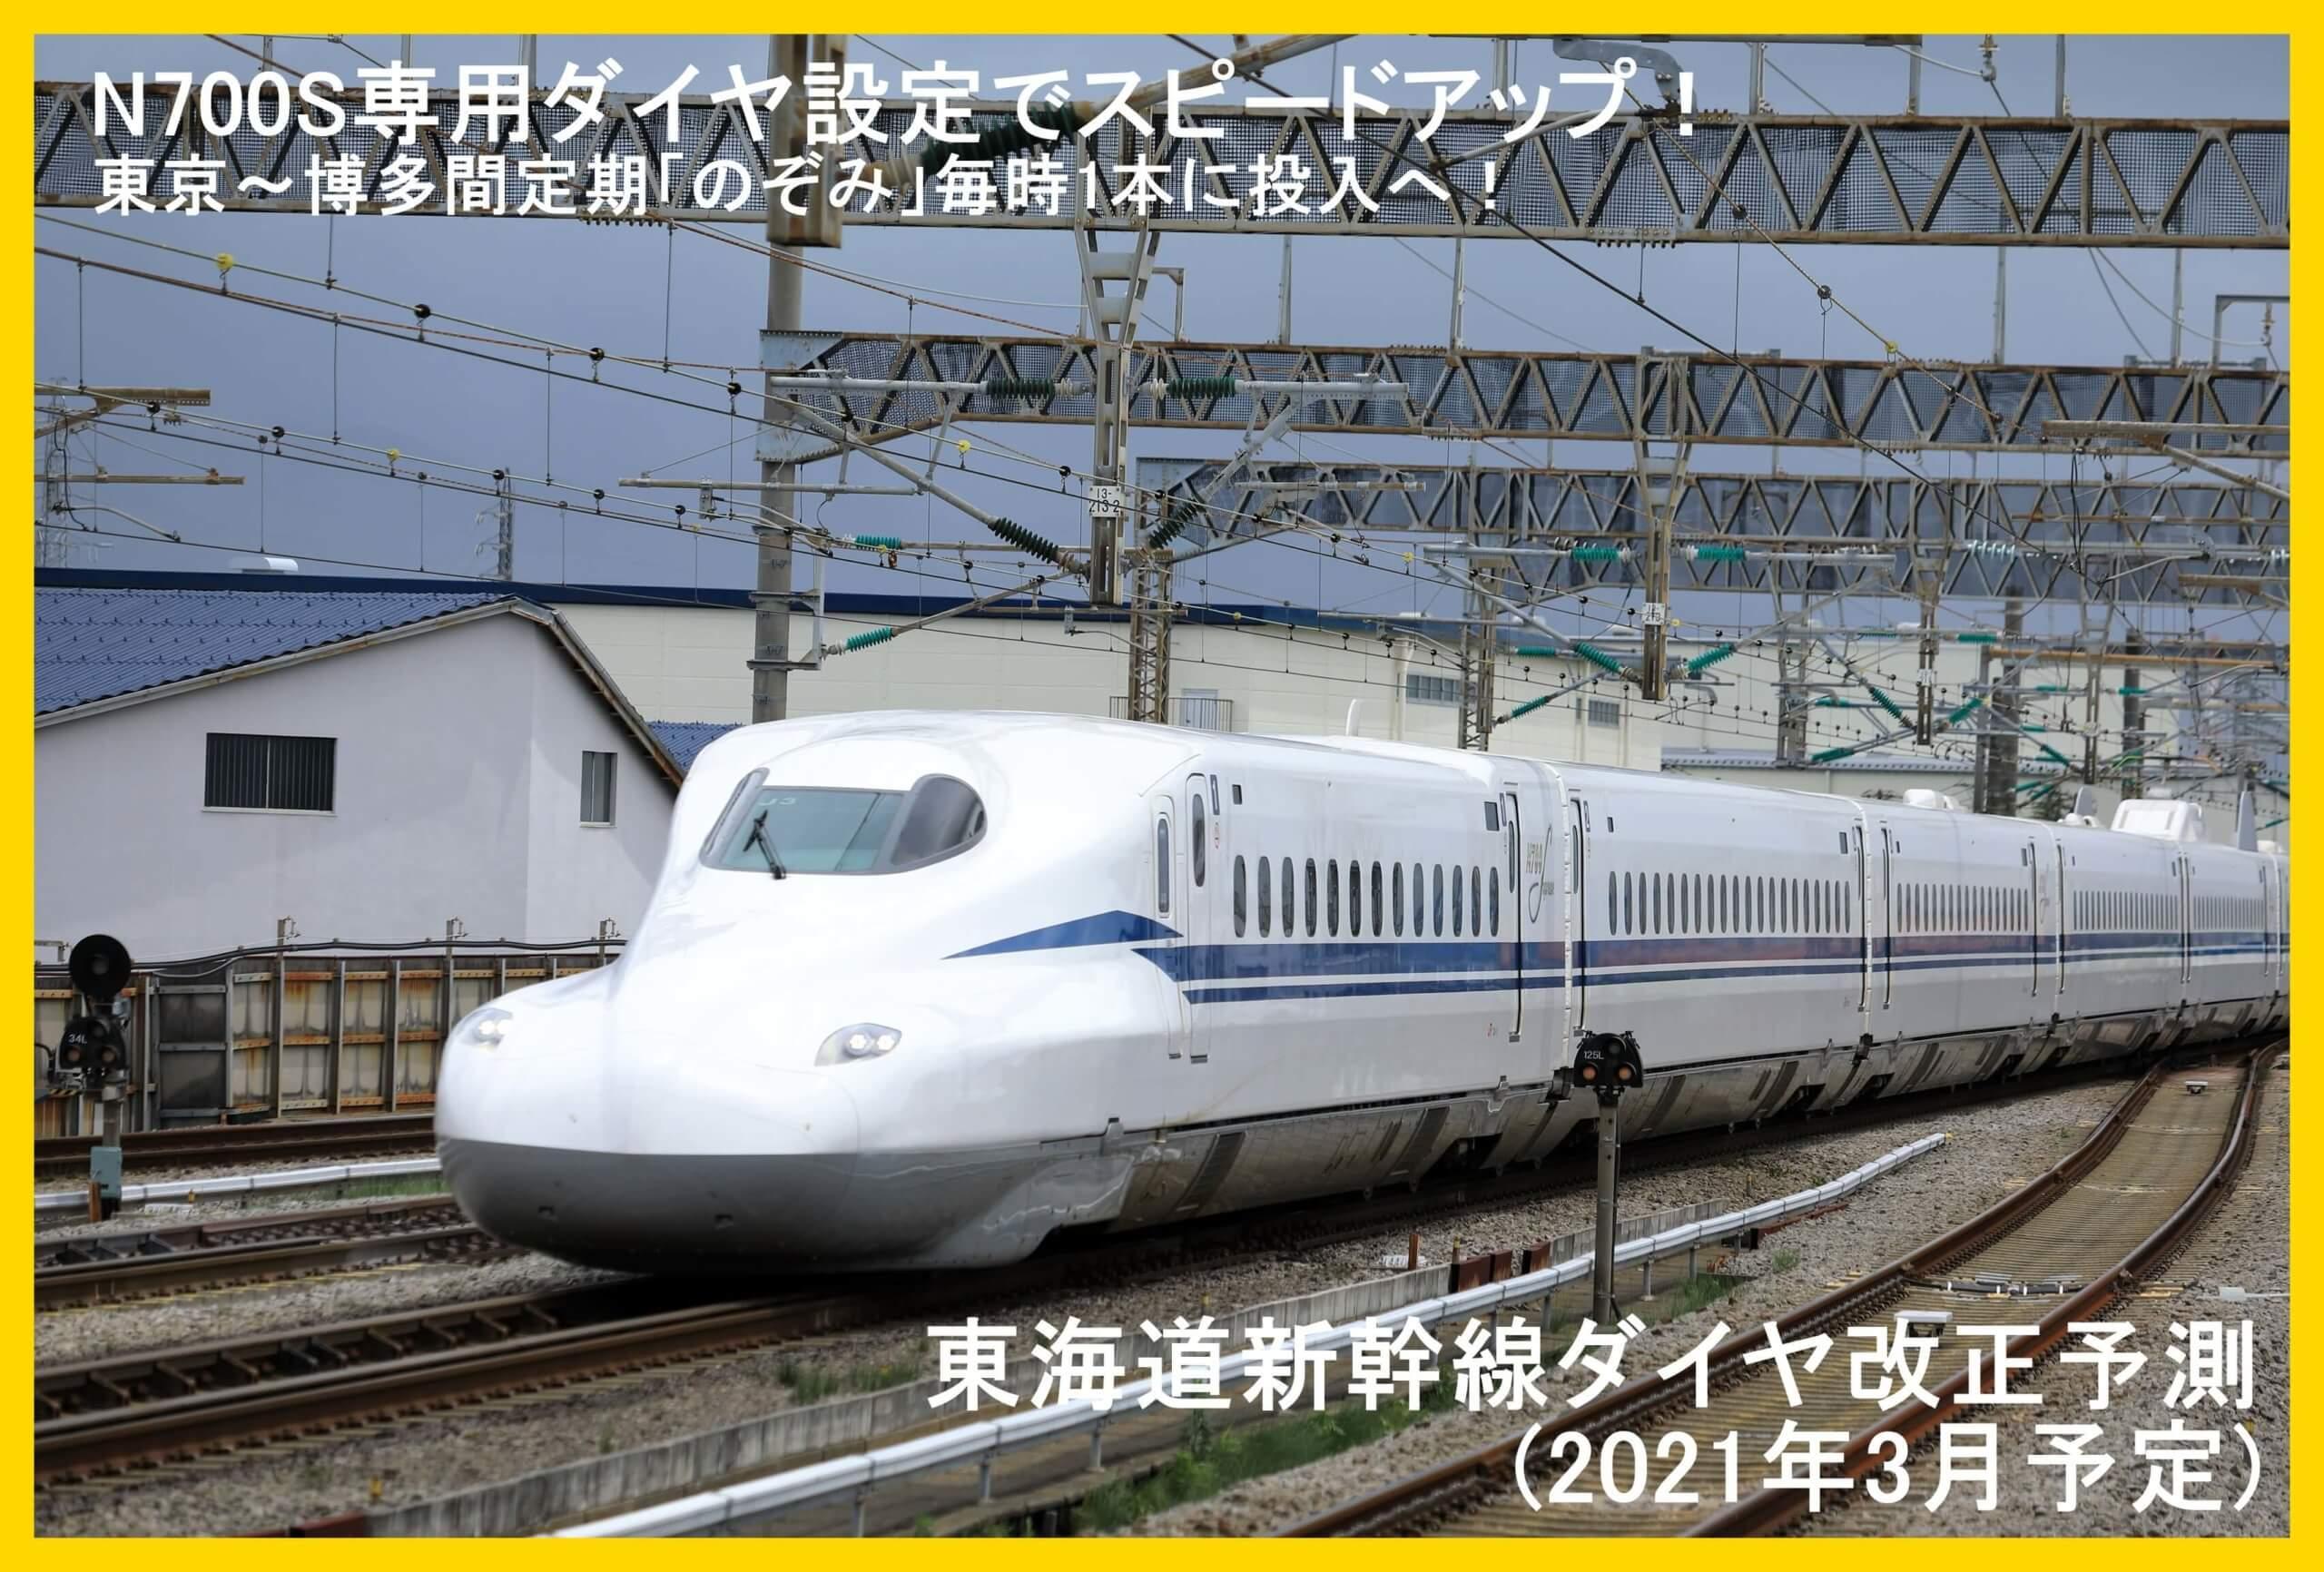 N700S専用ダイヤ設定でスピードアップ! 東海道新幹線ダイヤ改正予測(2021年3月予定)